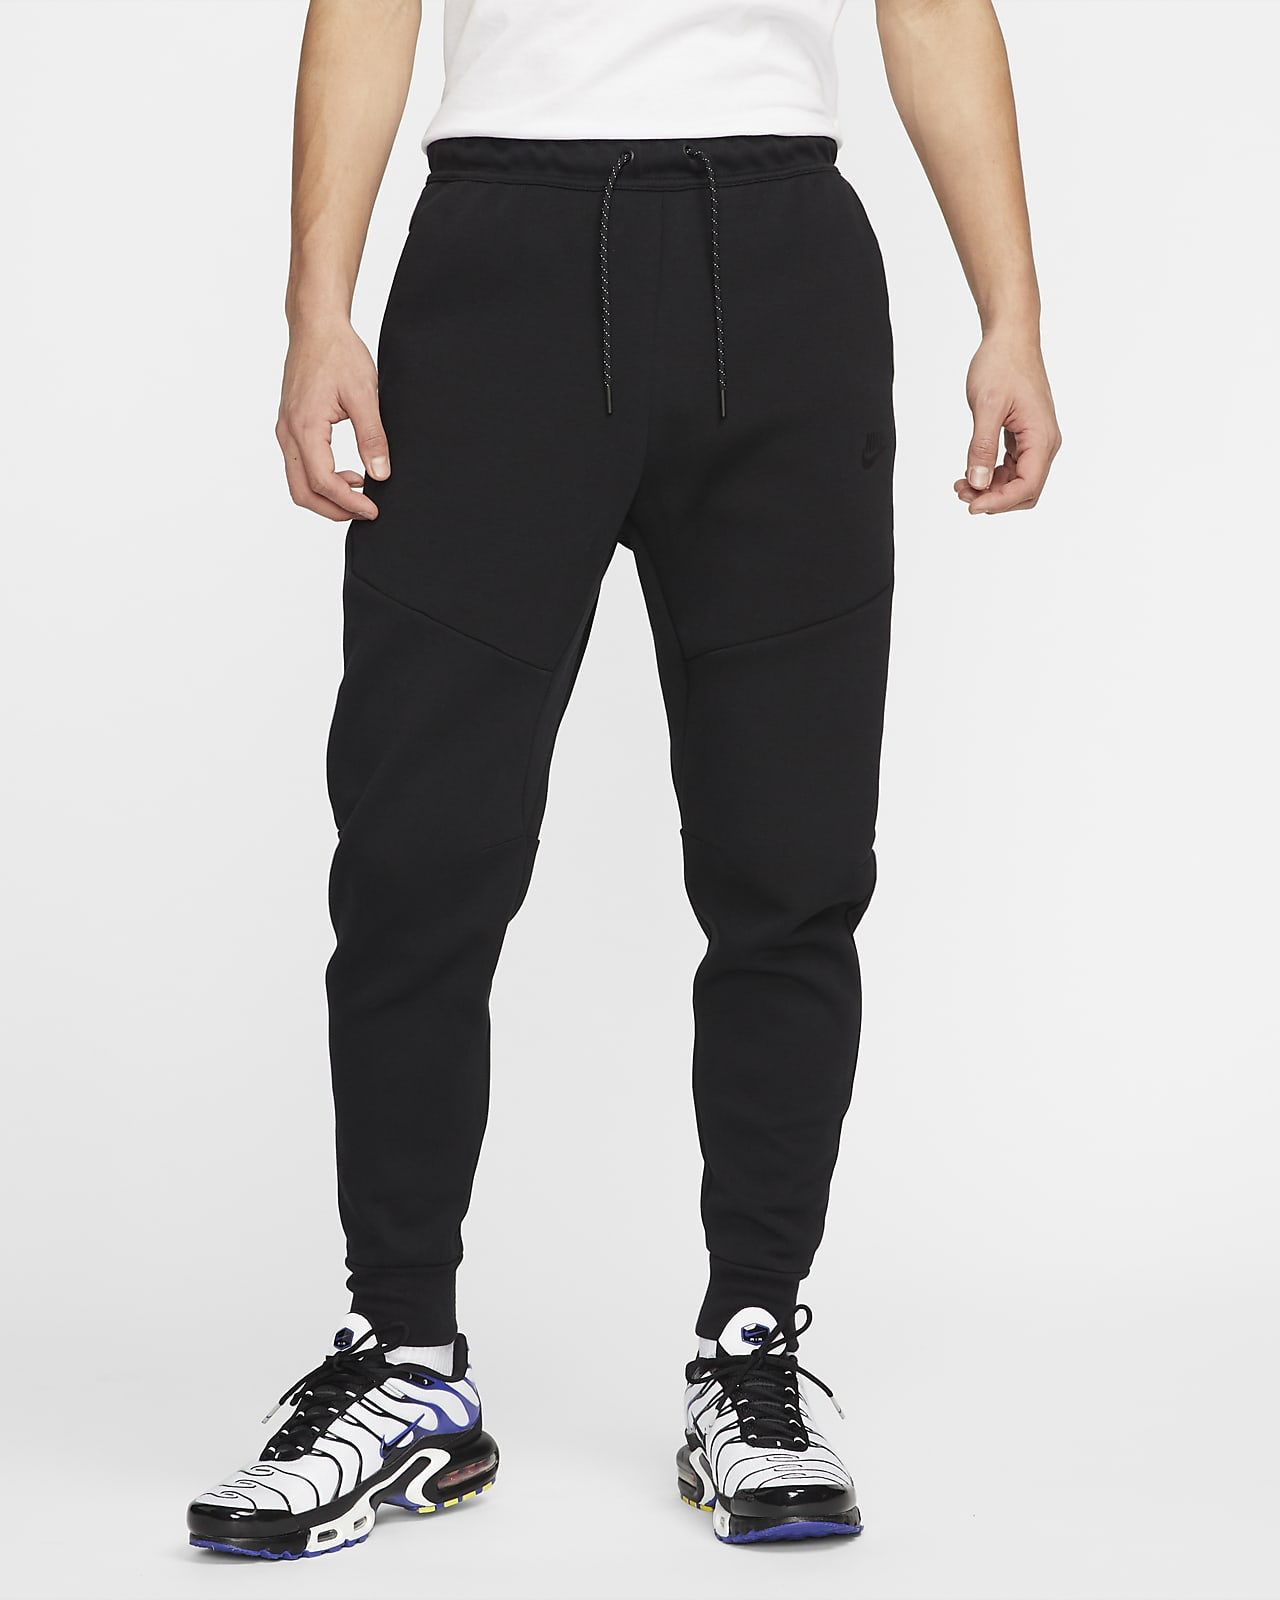 Nike Tech Fleece Men's Joggers